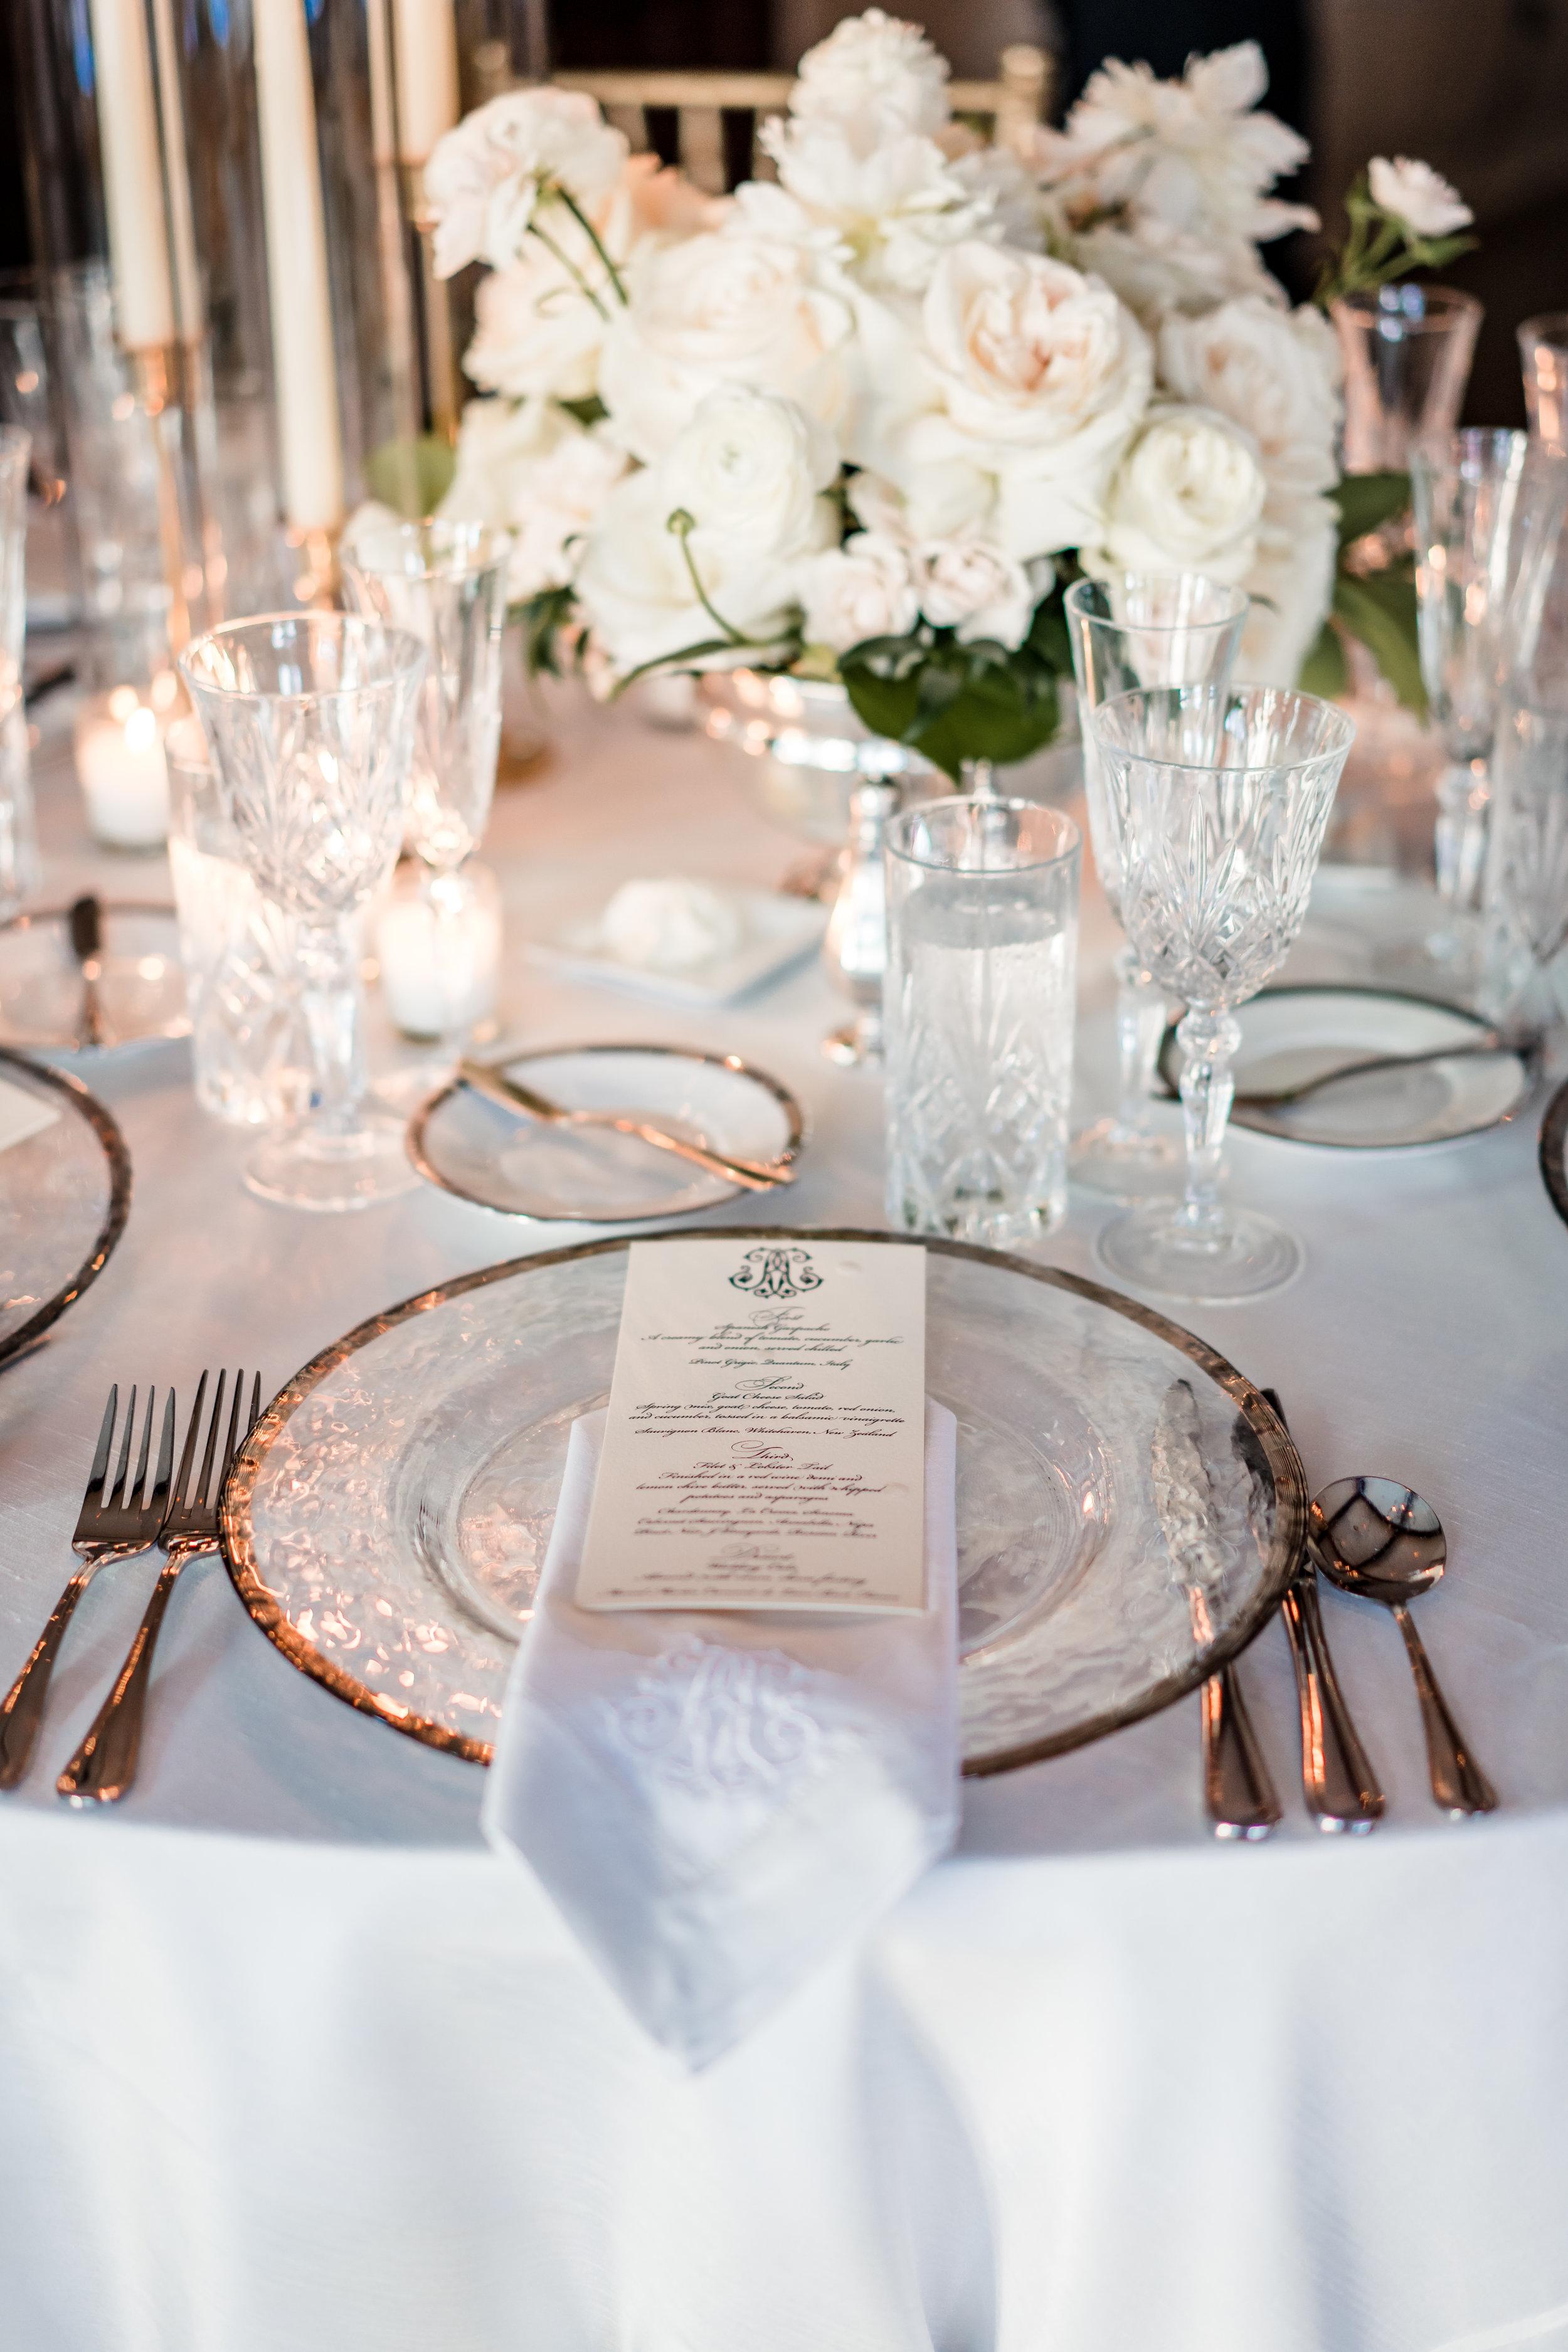 Private home wedding reception